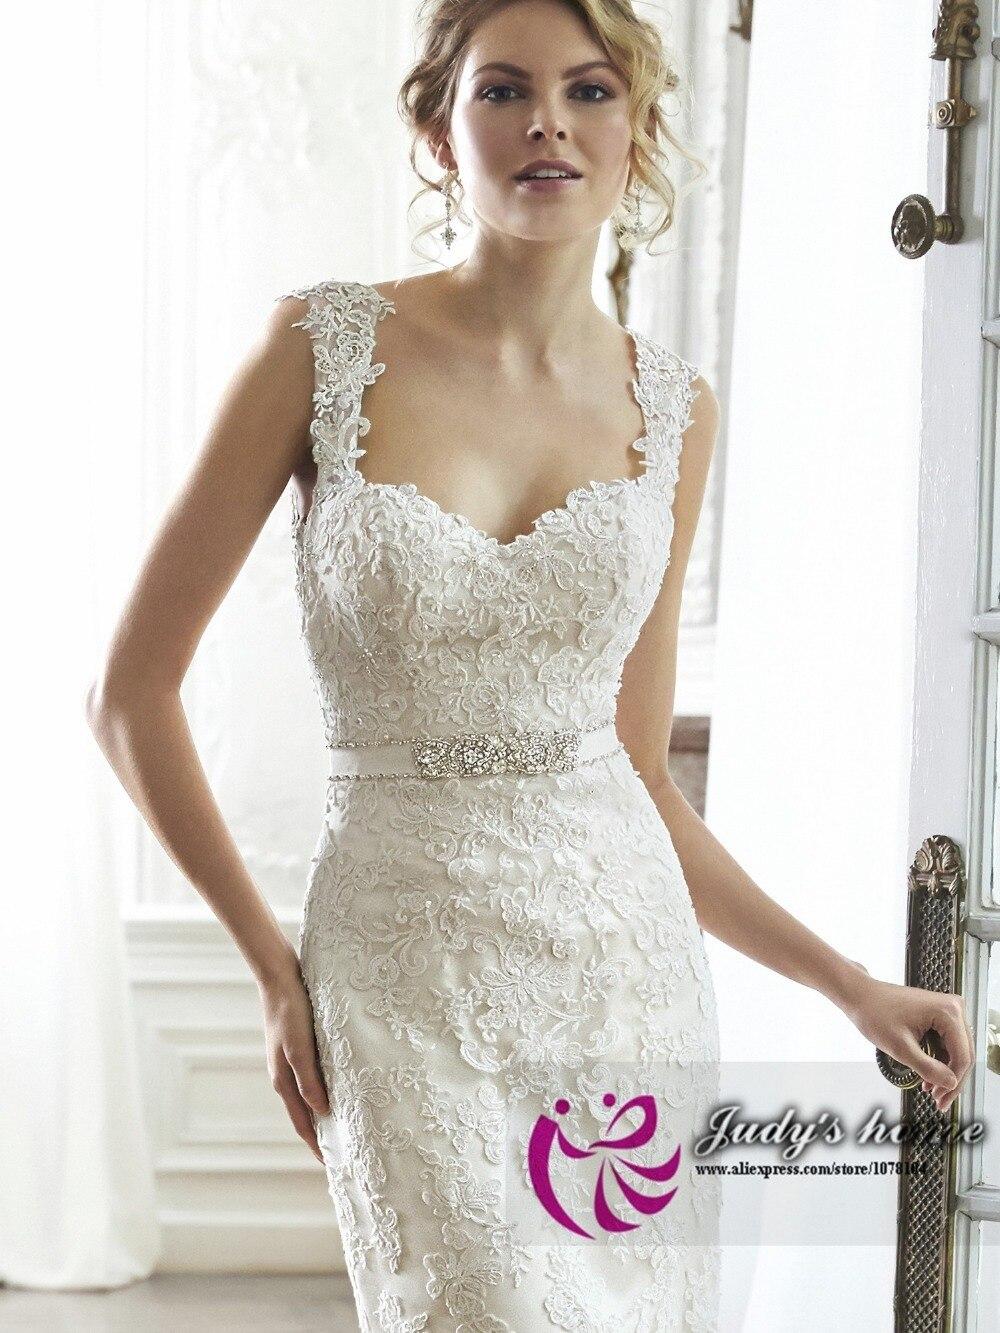 dress - Wedding Lace dress patterns video